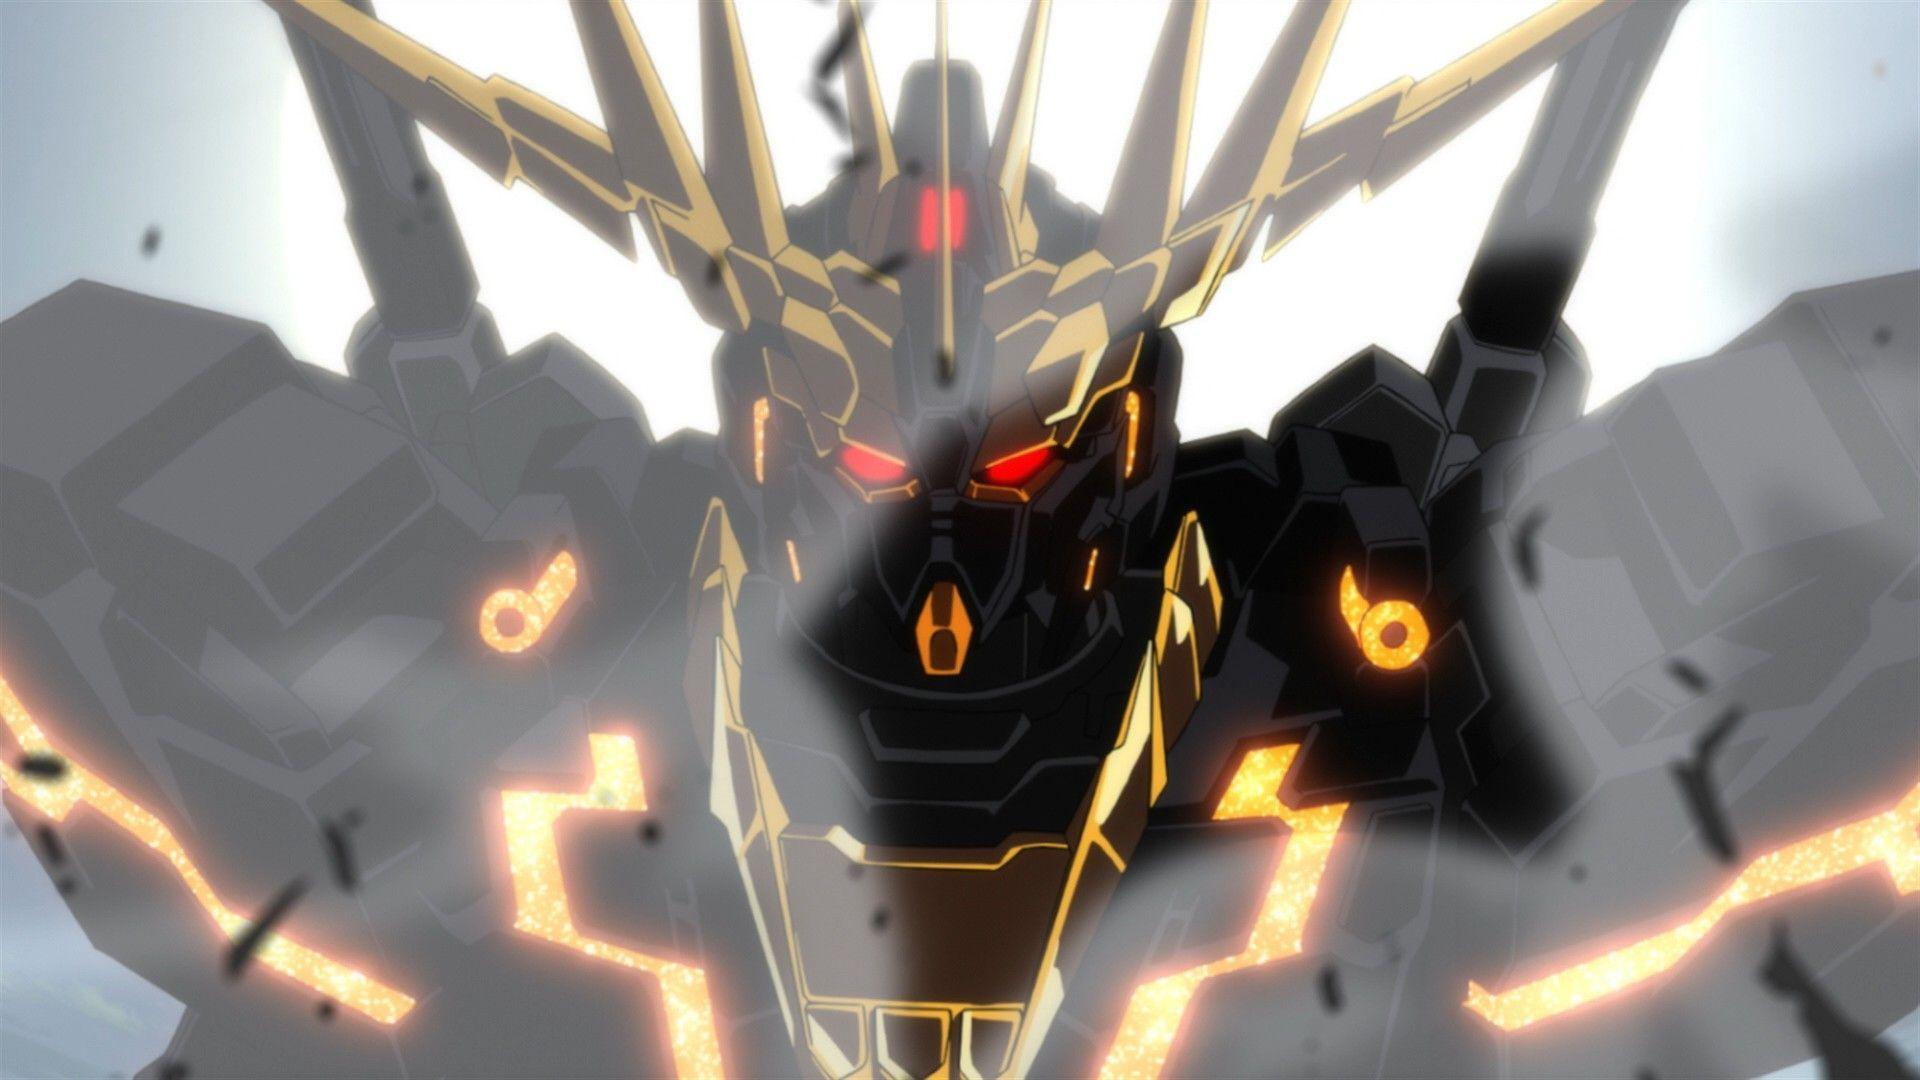 Gundam Banshee Wallpapers HD - Wallpaper Cave Gundam Banshee Wallpaper